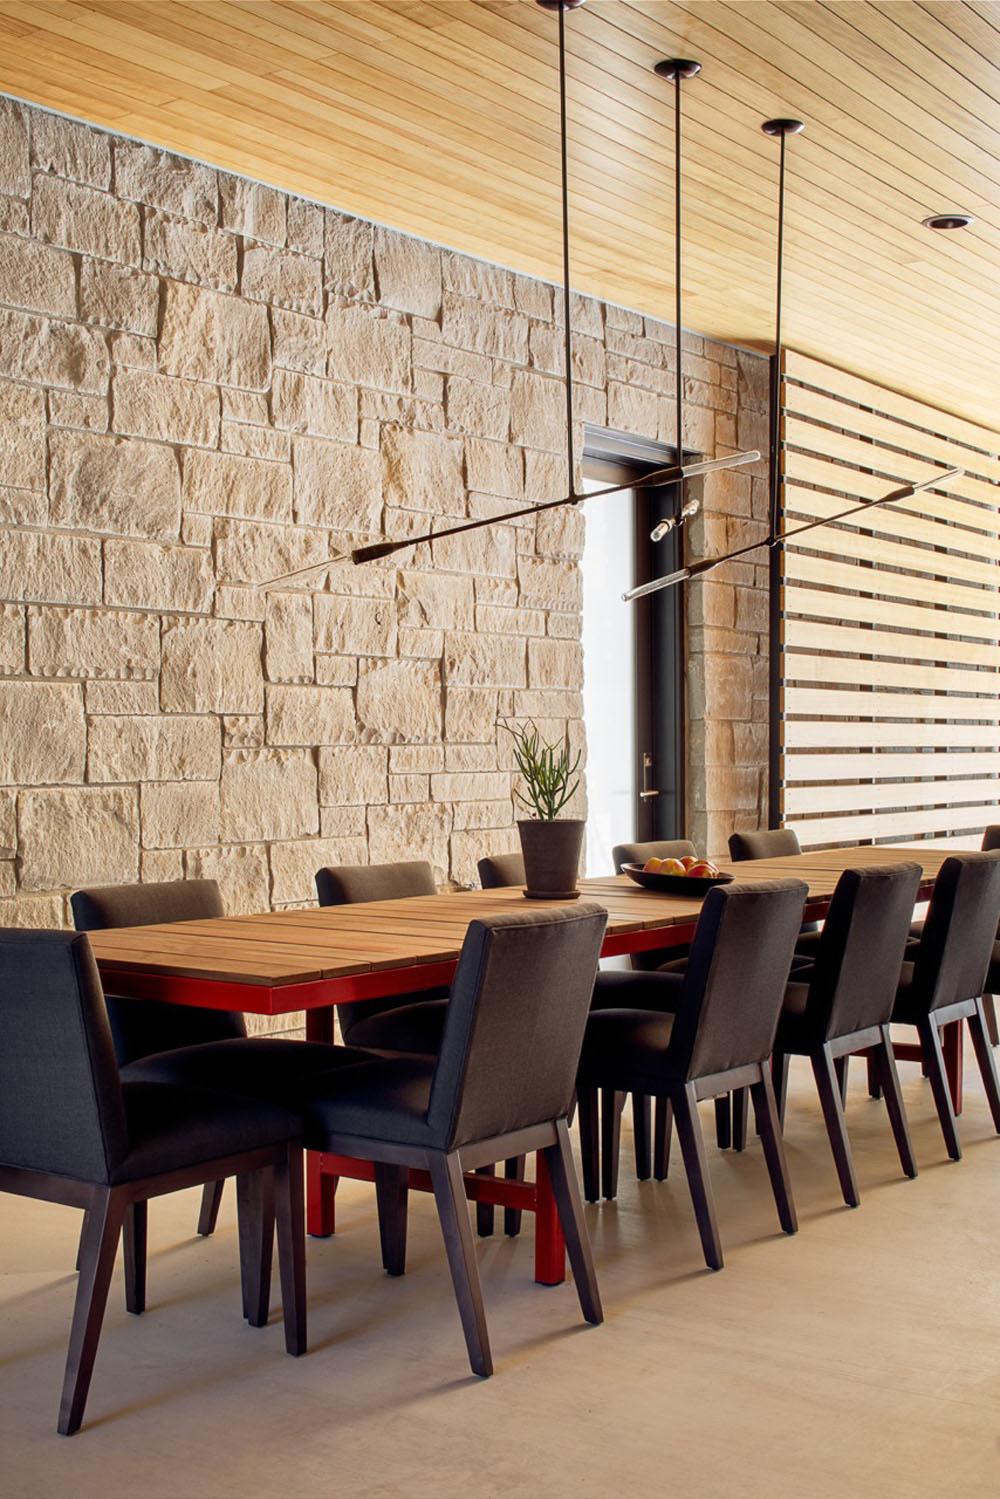 Dise o de casa de un piso con fachada en piedra y madera - Paredes modernas para interiores ...